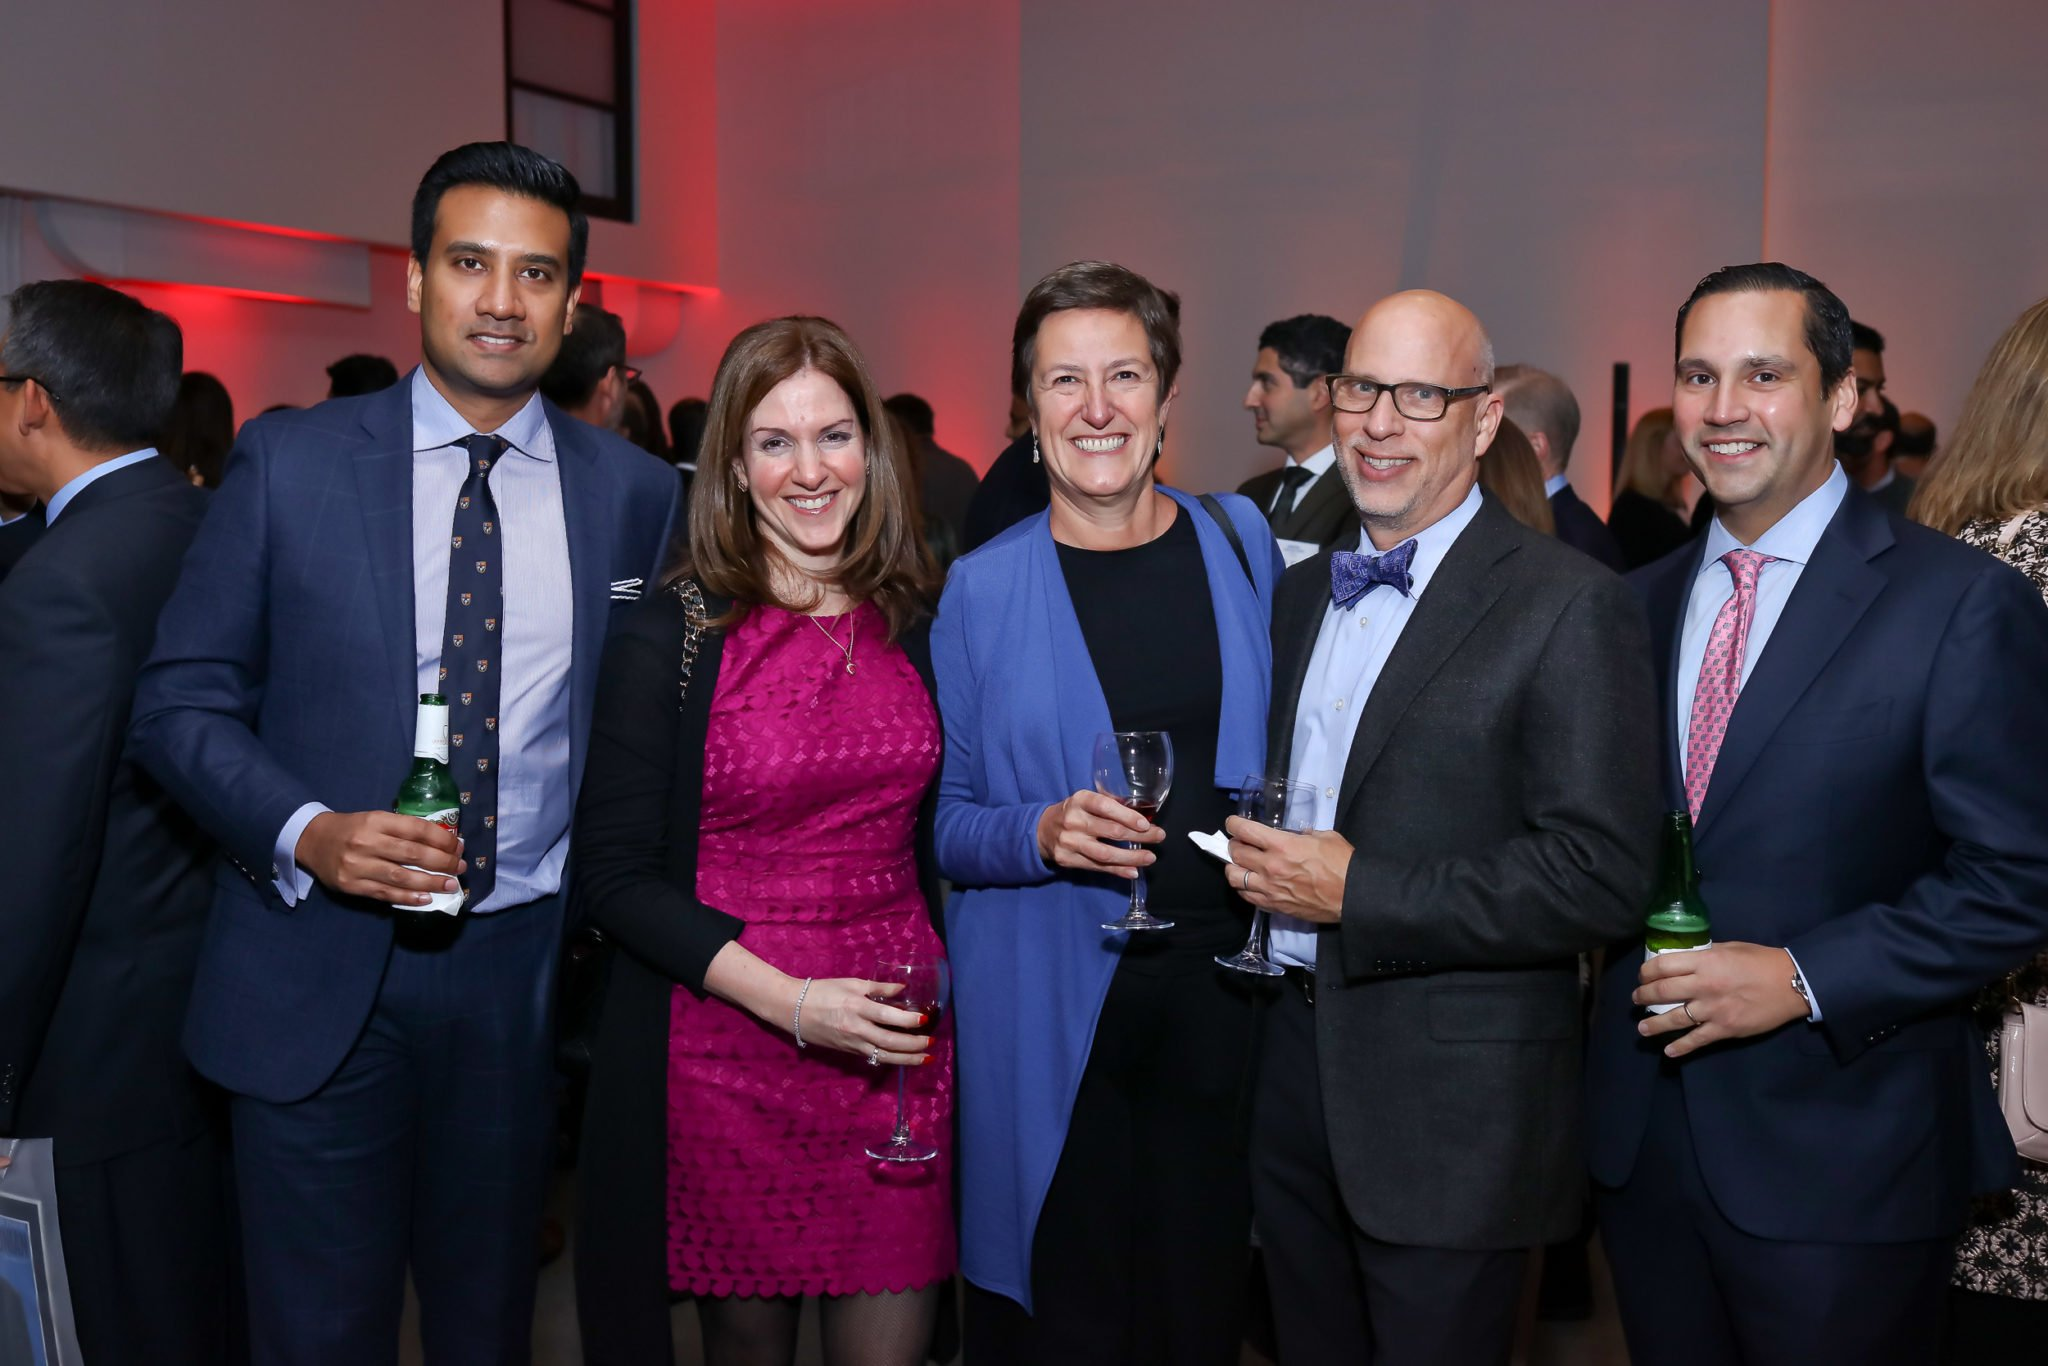 Photos from Washingtonian's 2017 Top Doctors Reception